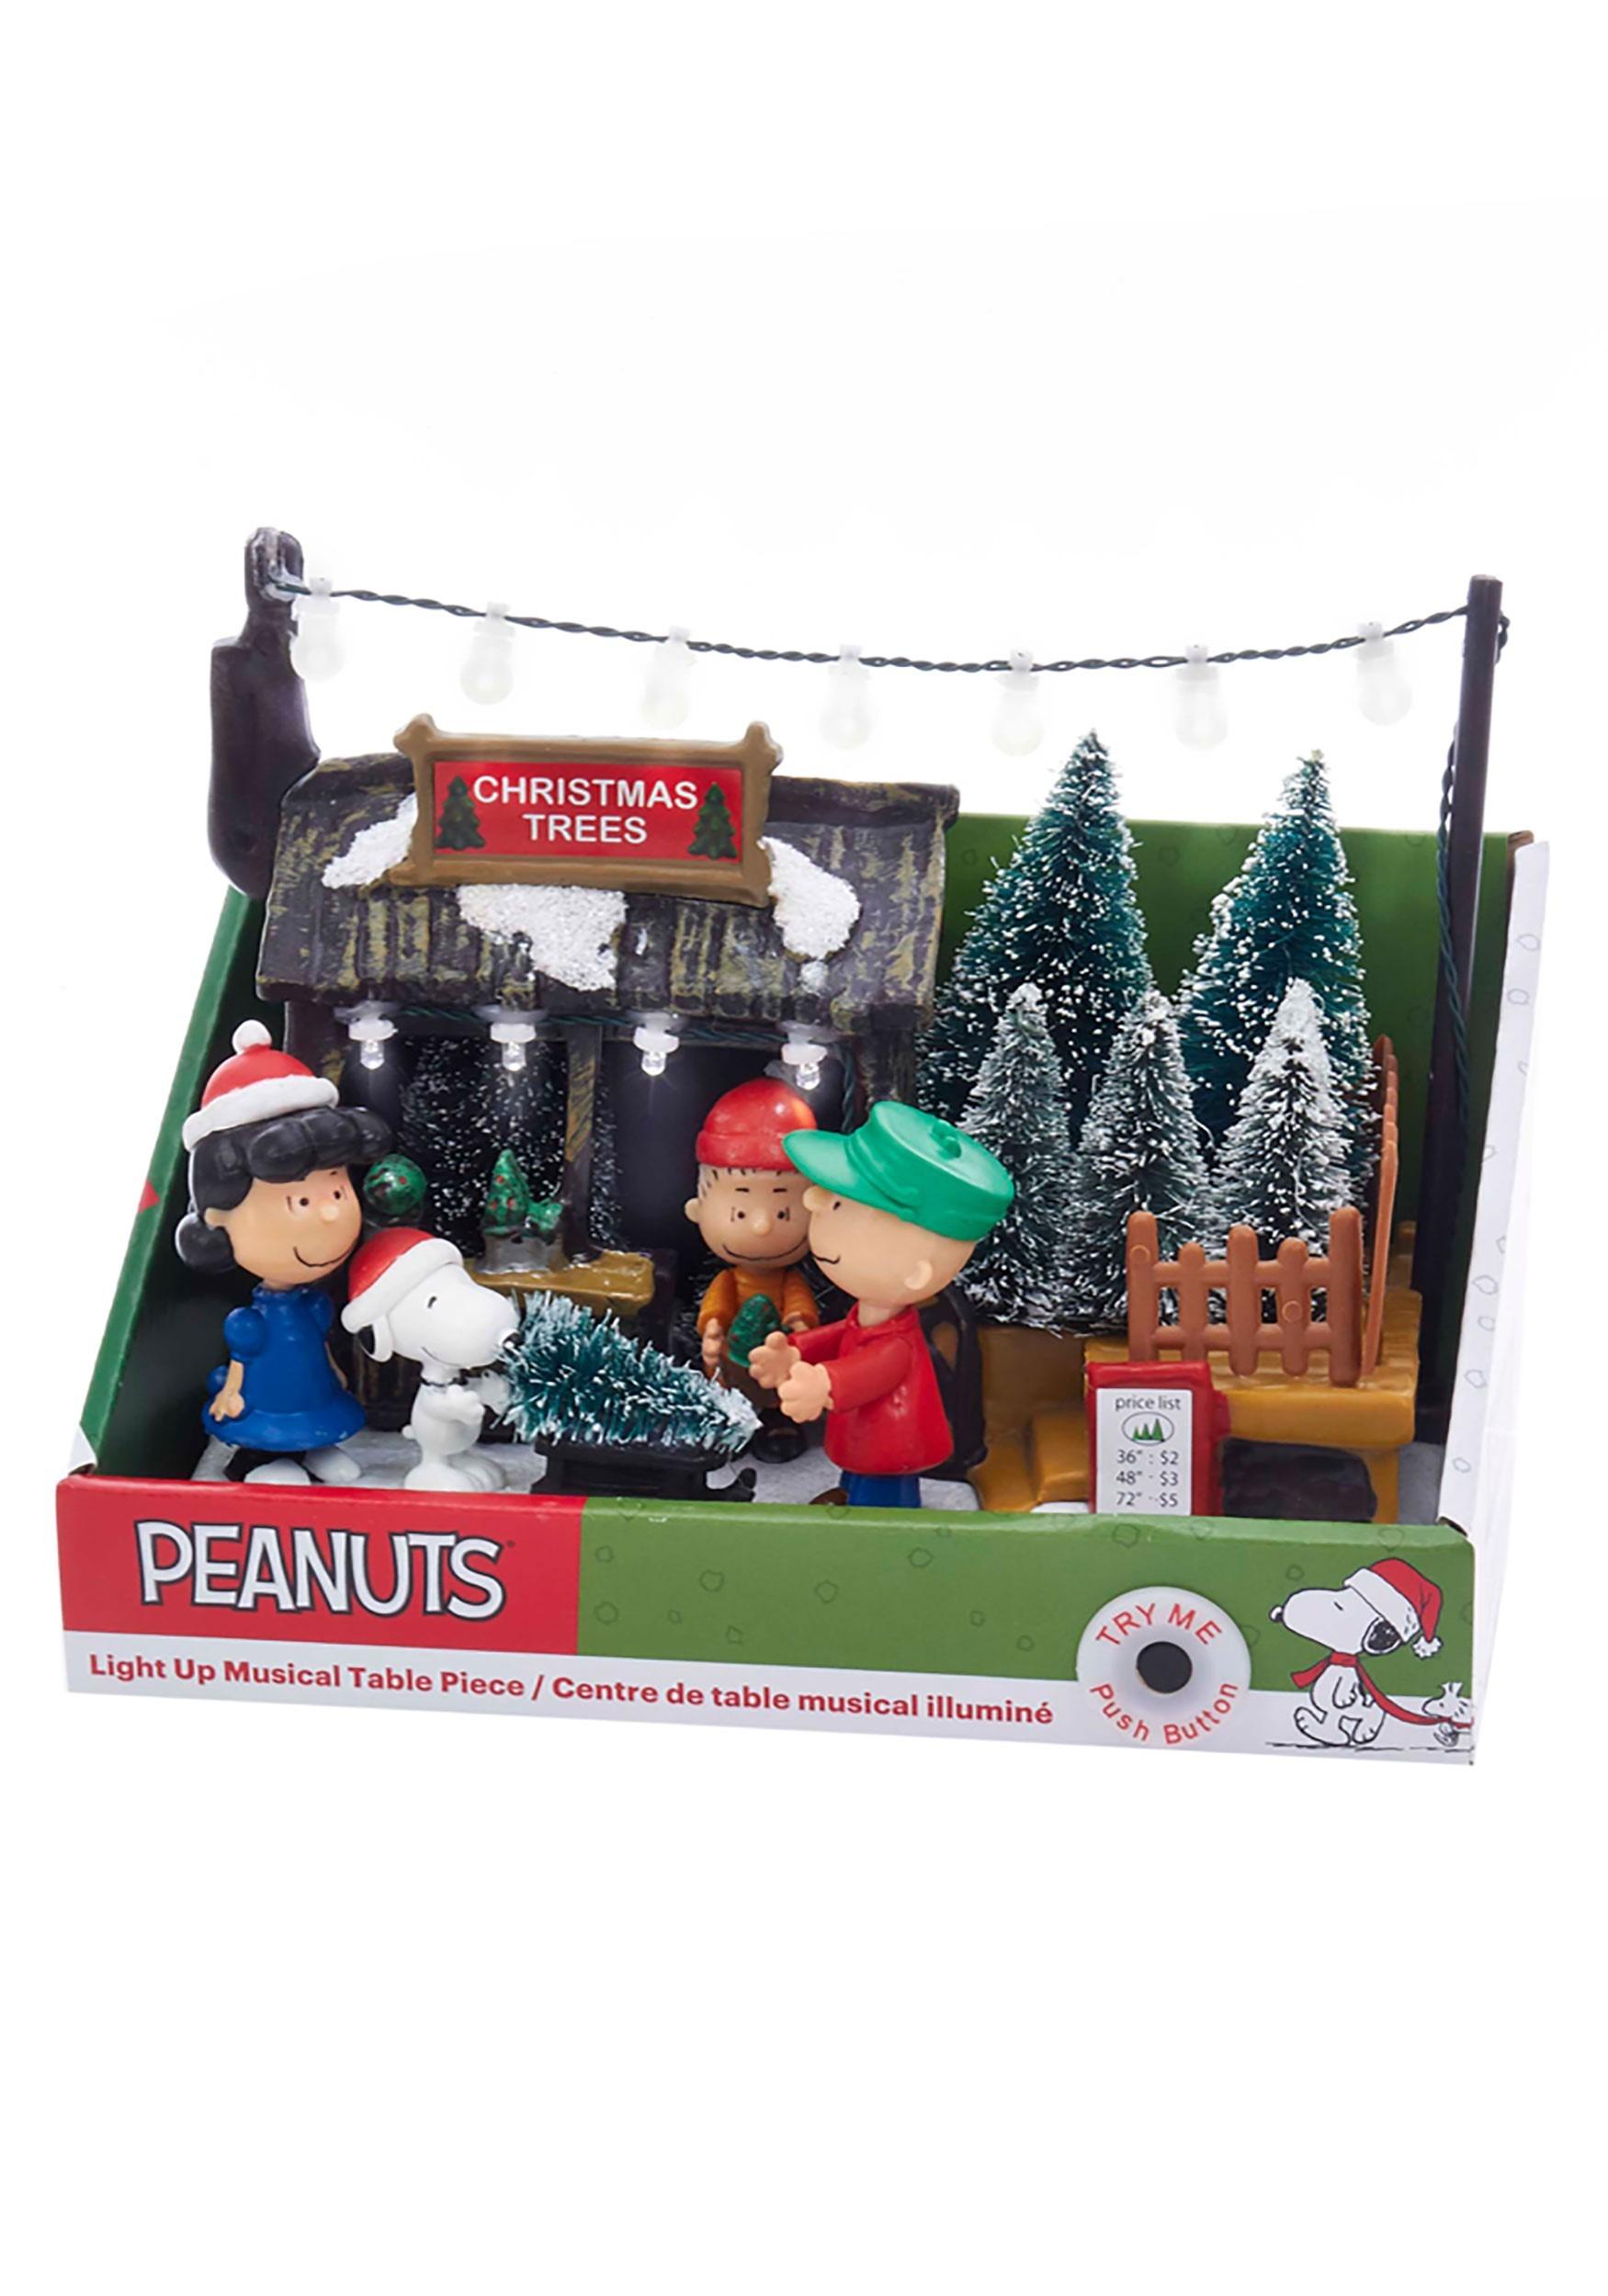 Peanuts Christmas Musical.Peanuts Musical Animated Christmas Tree Shop Table